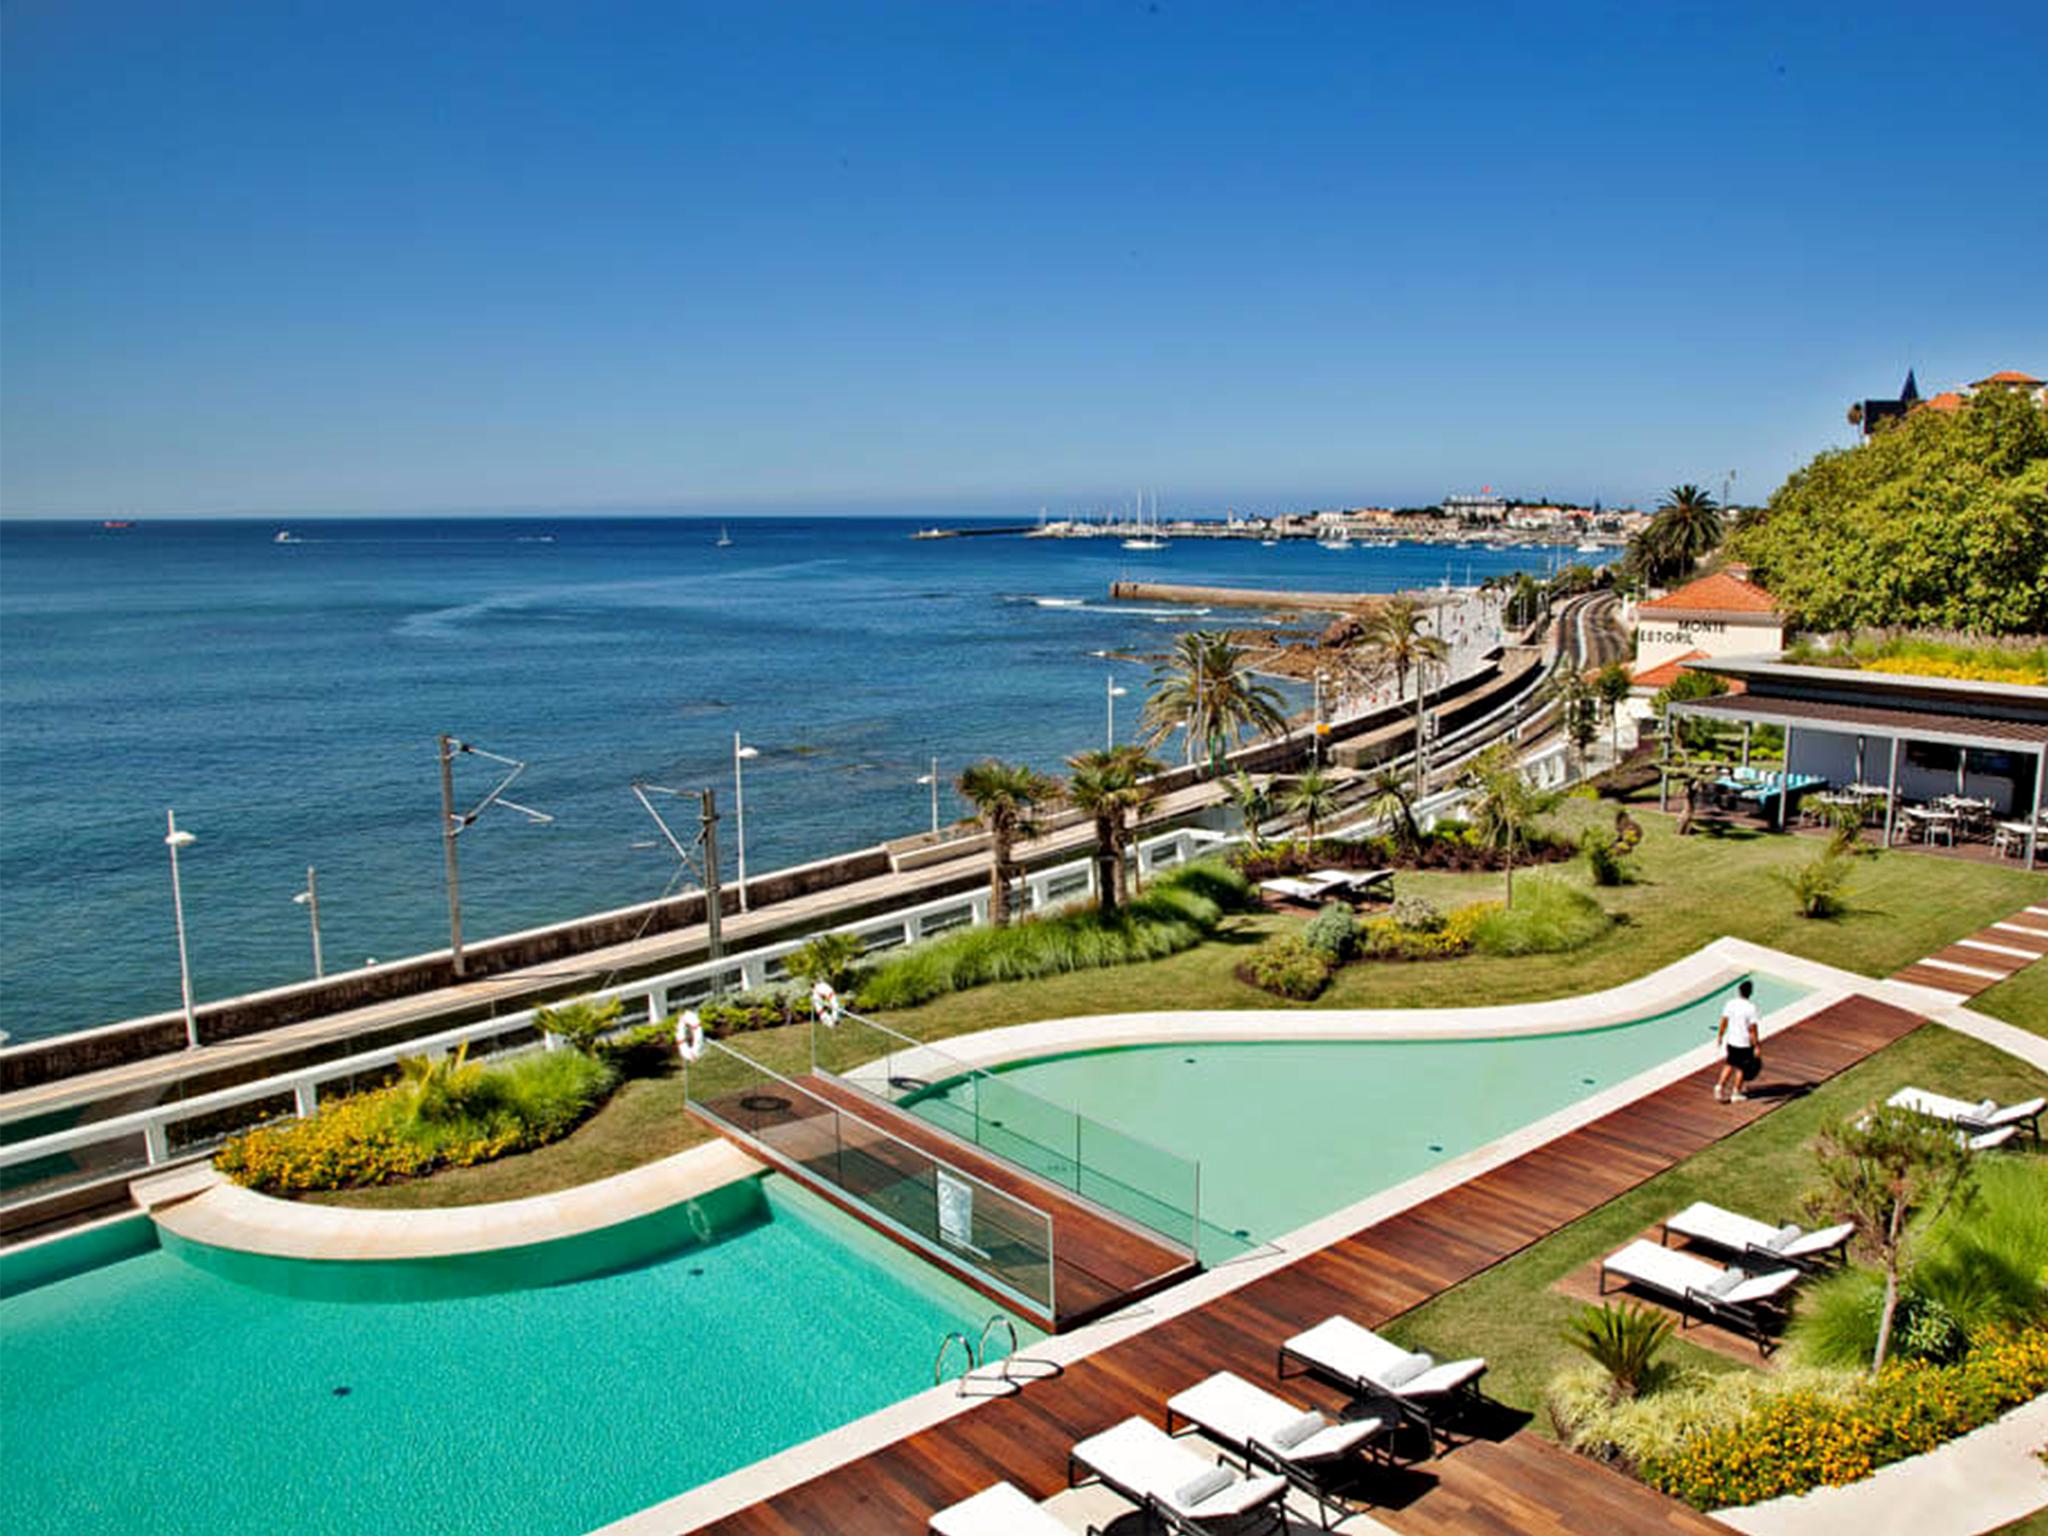 Hoteis, Hotel Intercontinental Estoril, Piscina